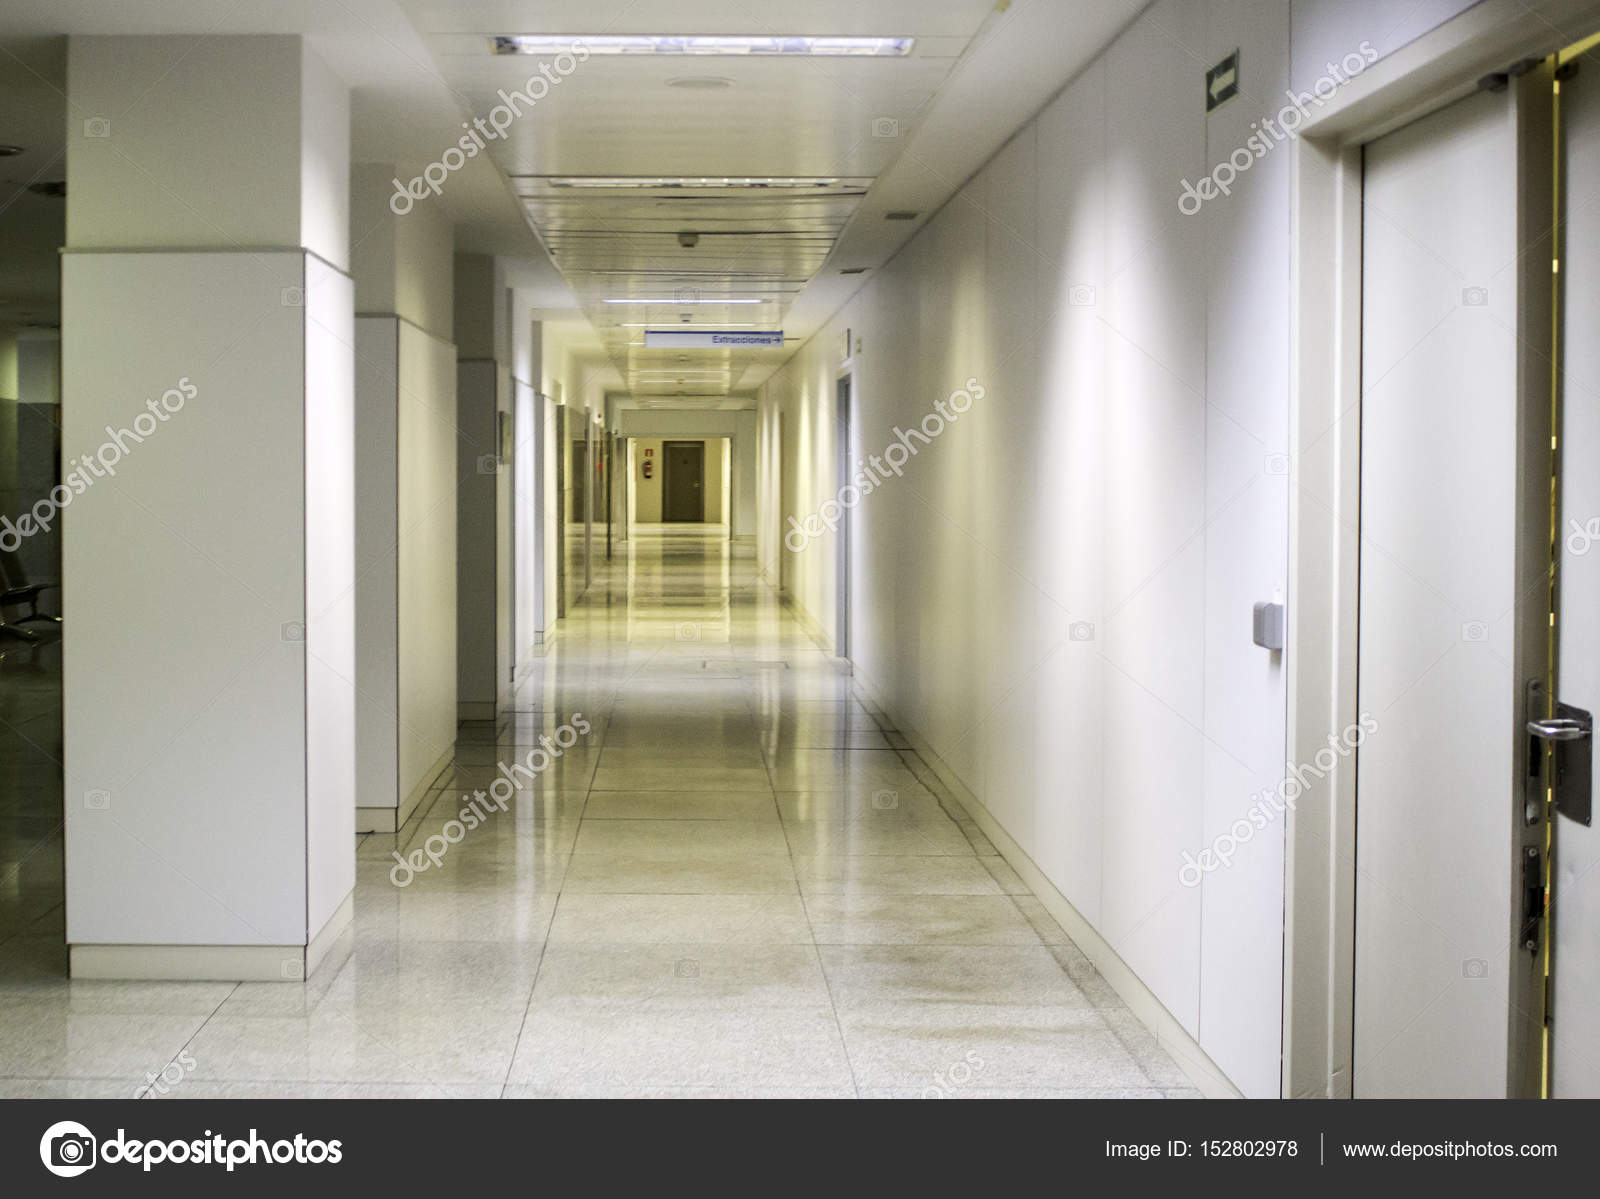 https://st3.depositphotos.com/1730367/15280/i/1600/depositphotos_152802978-stockafbeelding-interieur-gang-ziekenhuis.jpg